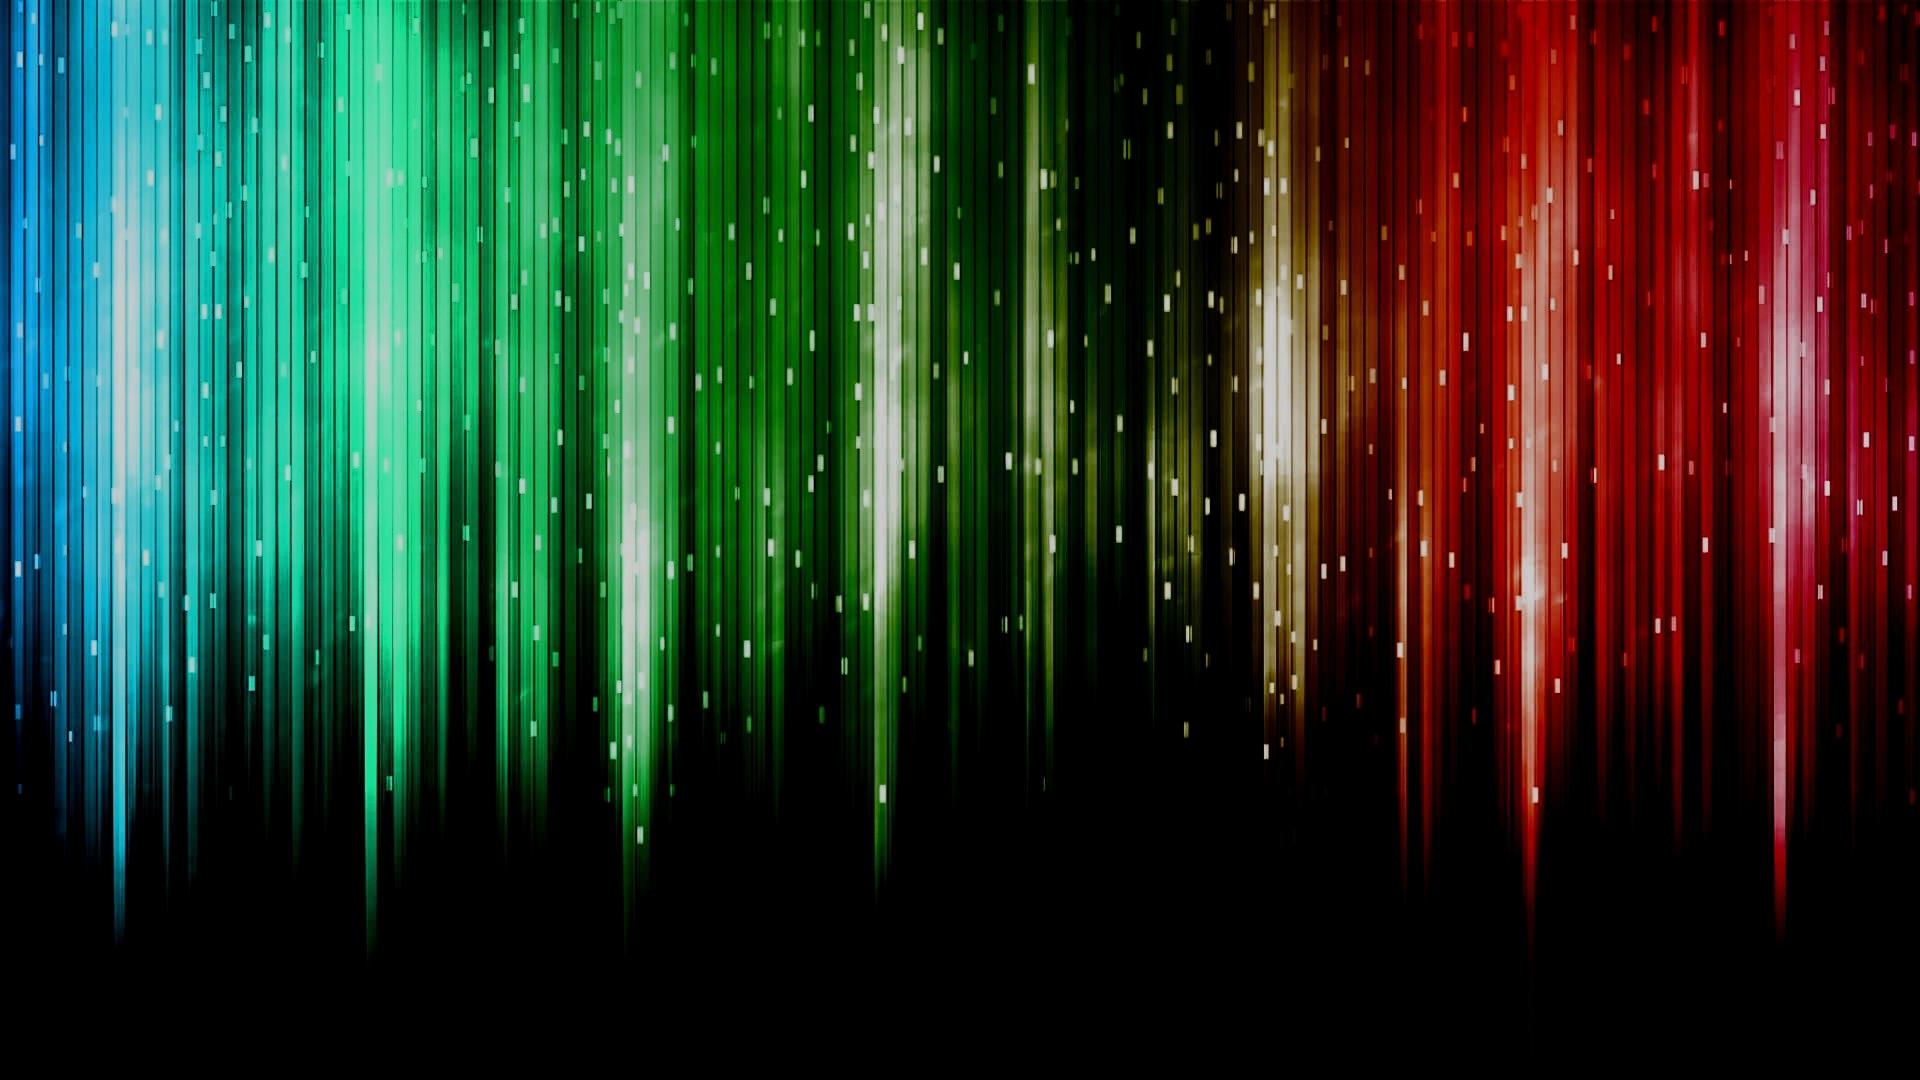 Rainbow 1920x1080